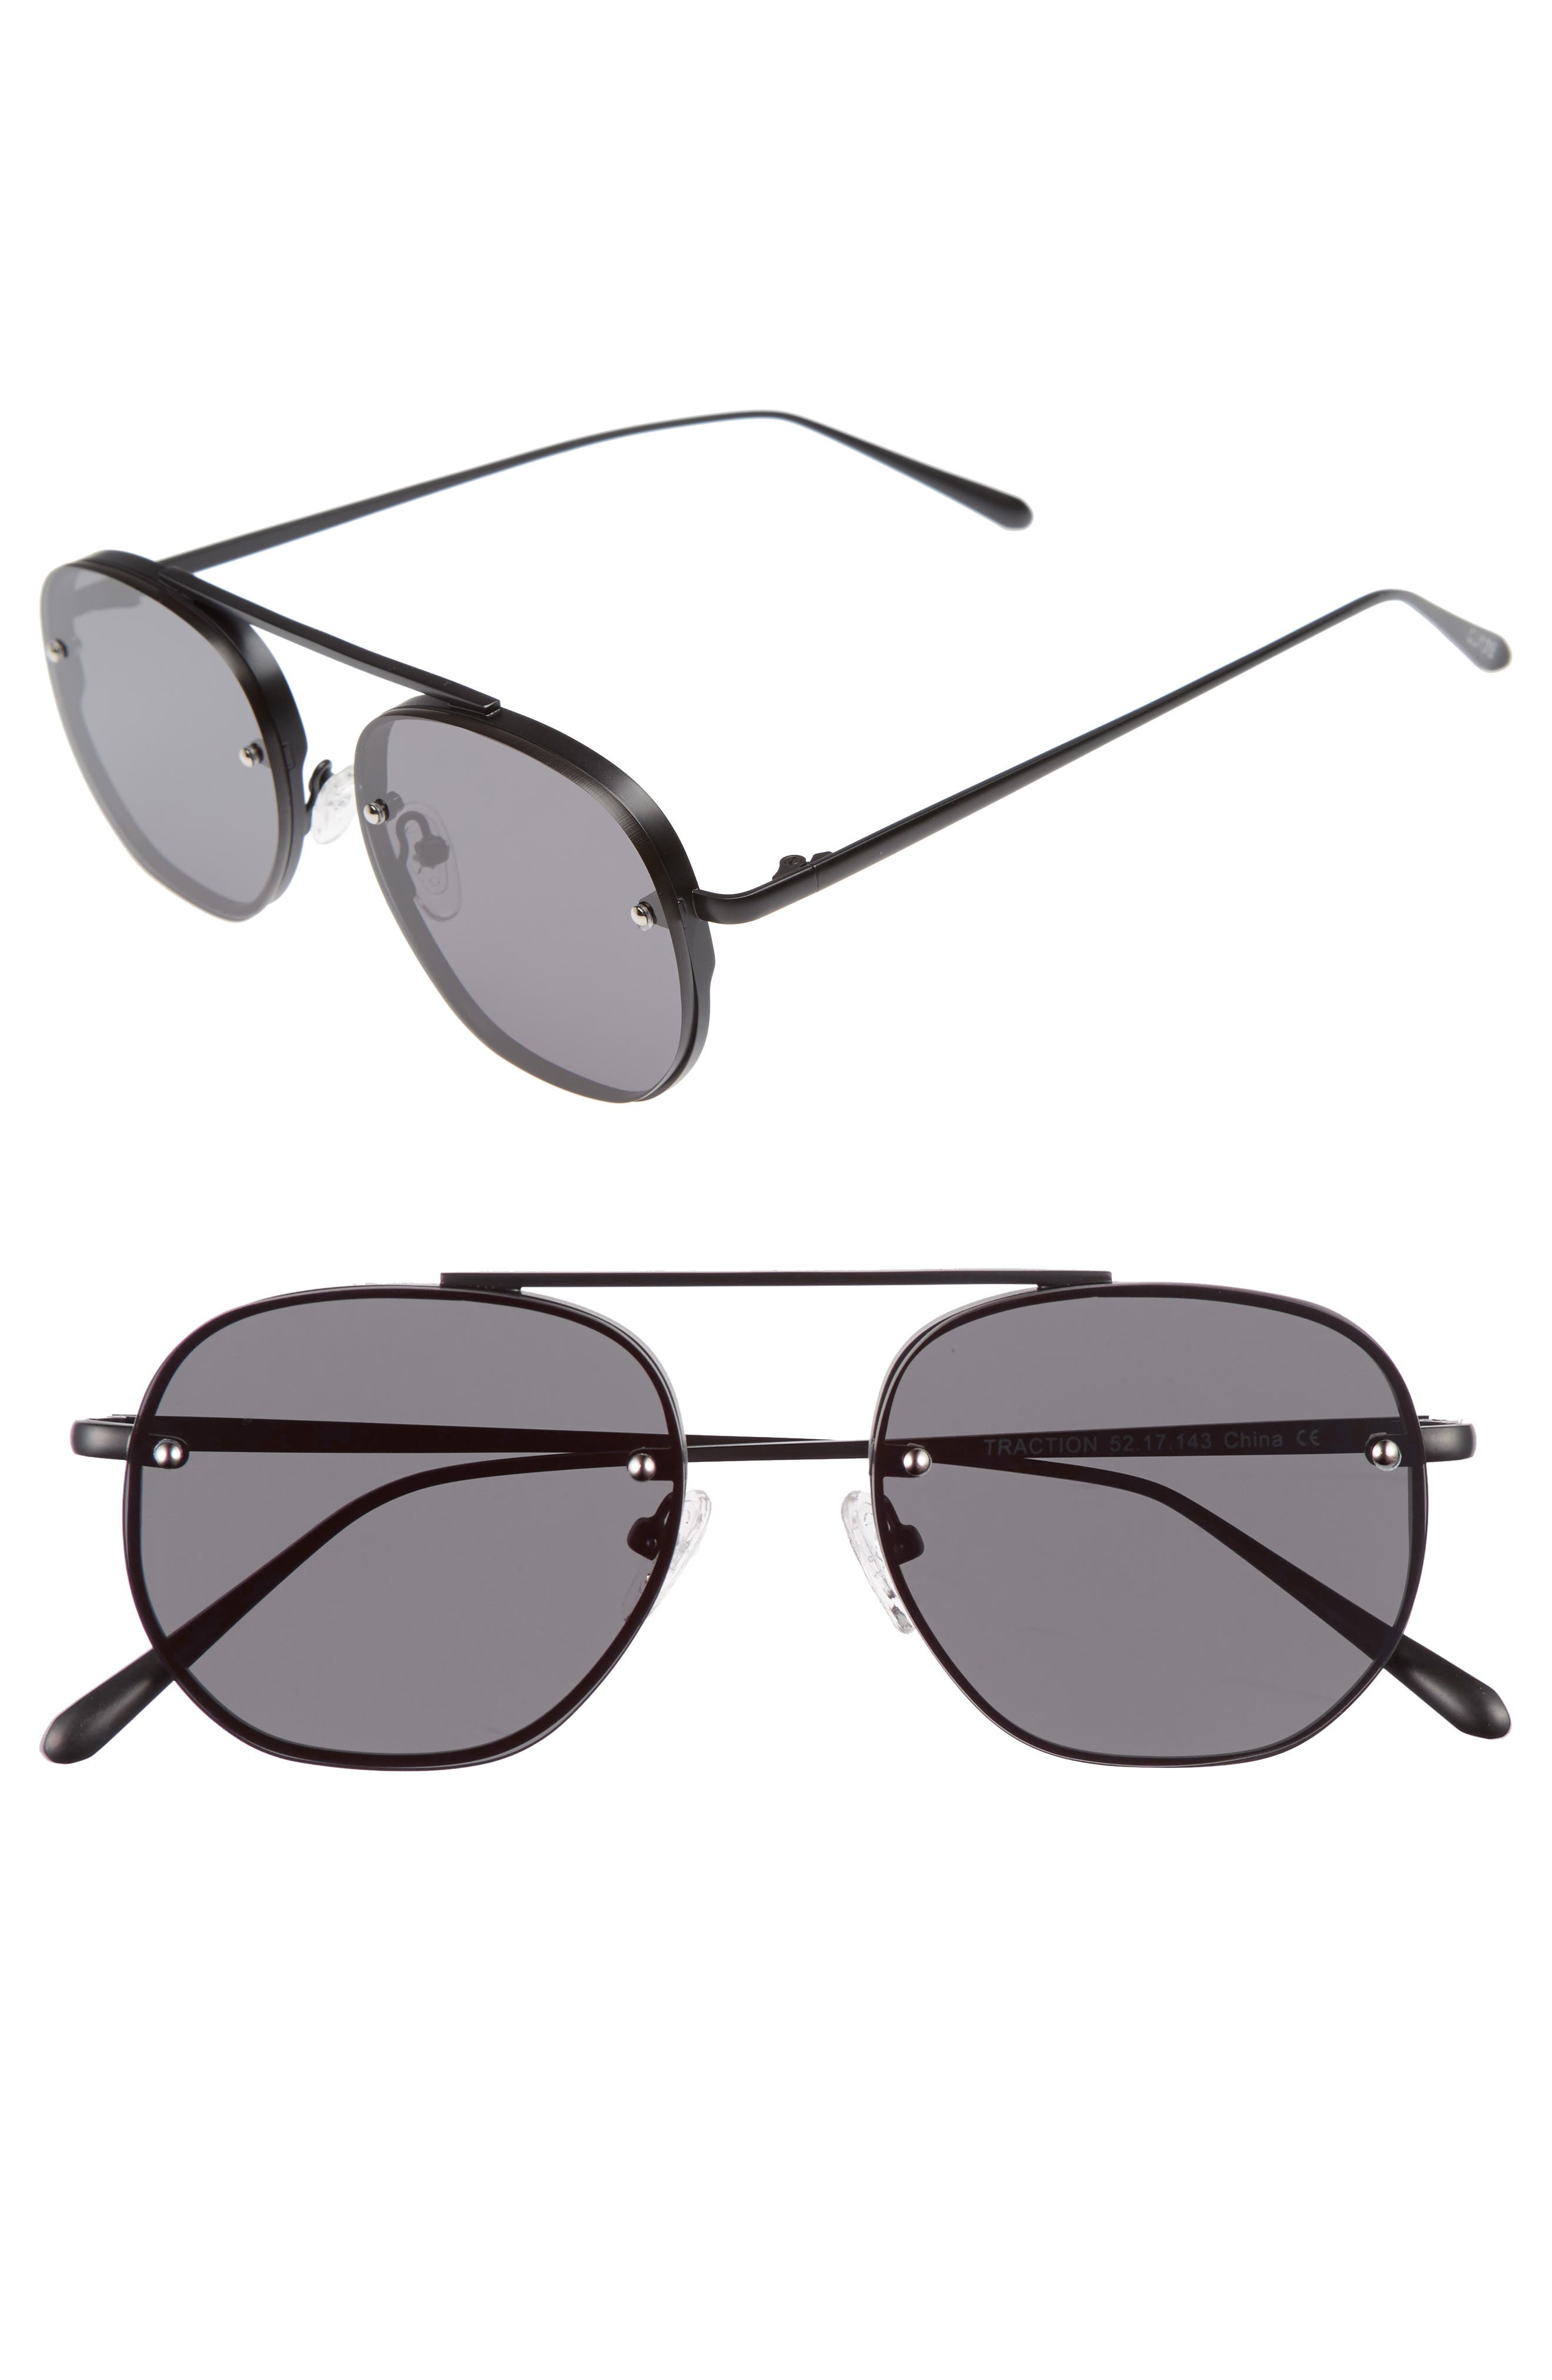 Traction 52mm Aviator Sunglasses,                             Main thumbnail 1, color,                             Gravity Black